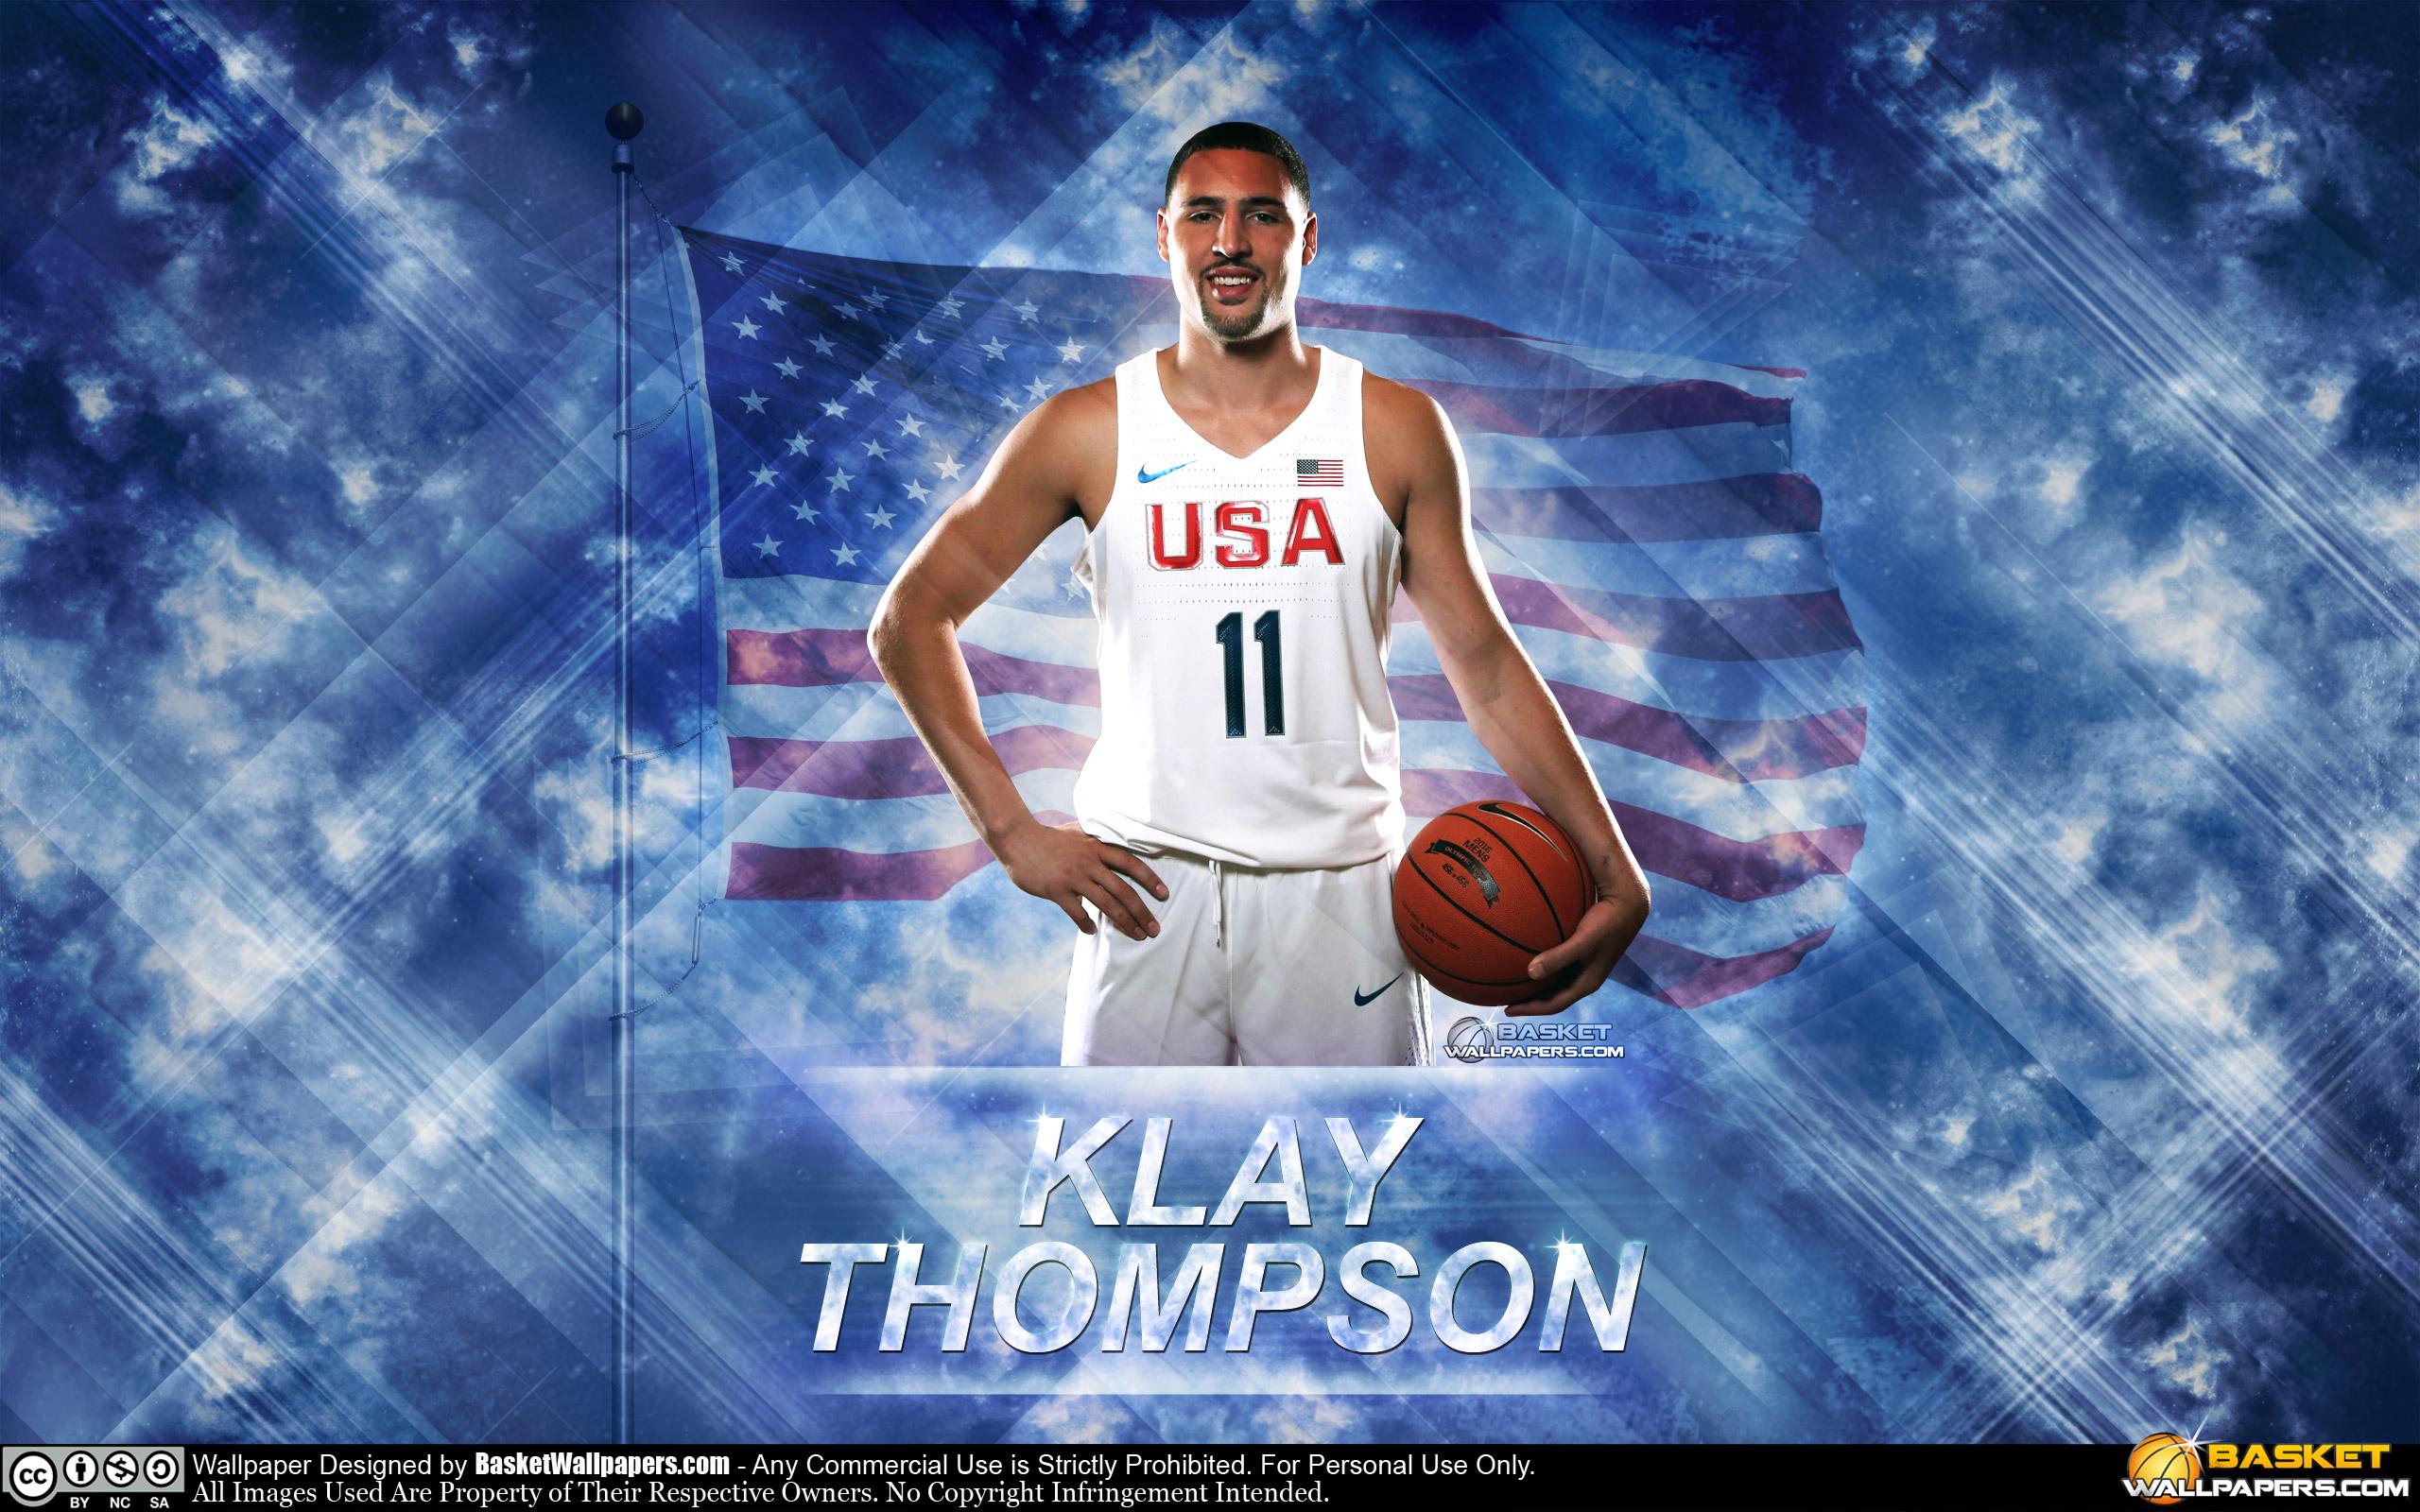 Klay Thompson USA 2016 Olympics Wallpaper